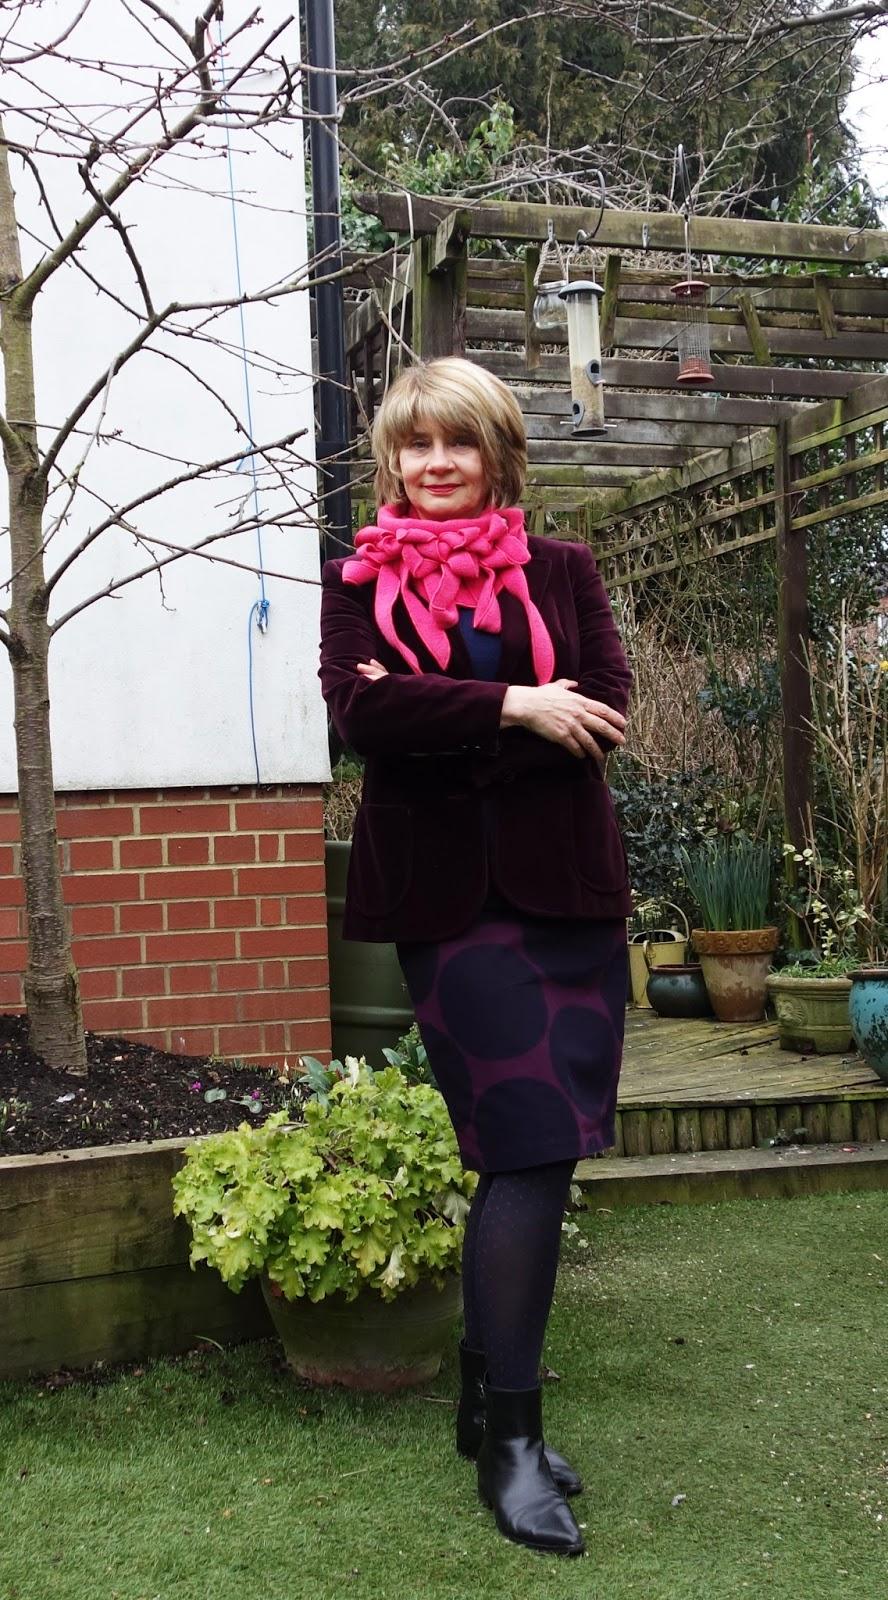 Striking Rew fuchsia scarf worn with burgundy by Gail Hanlon blogger